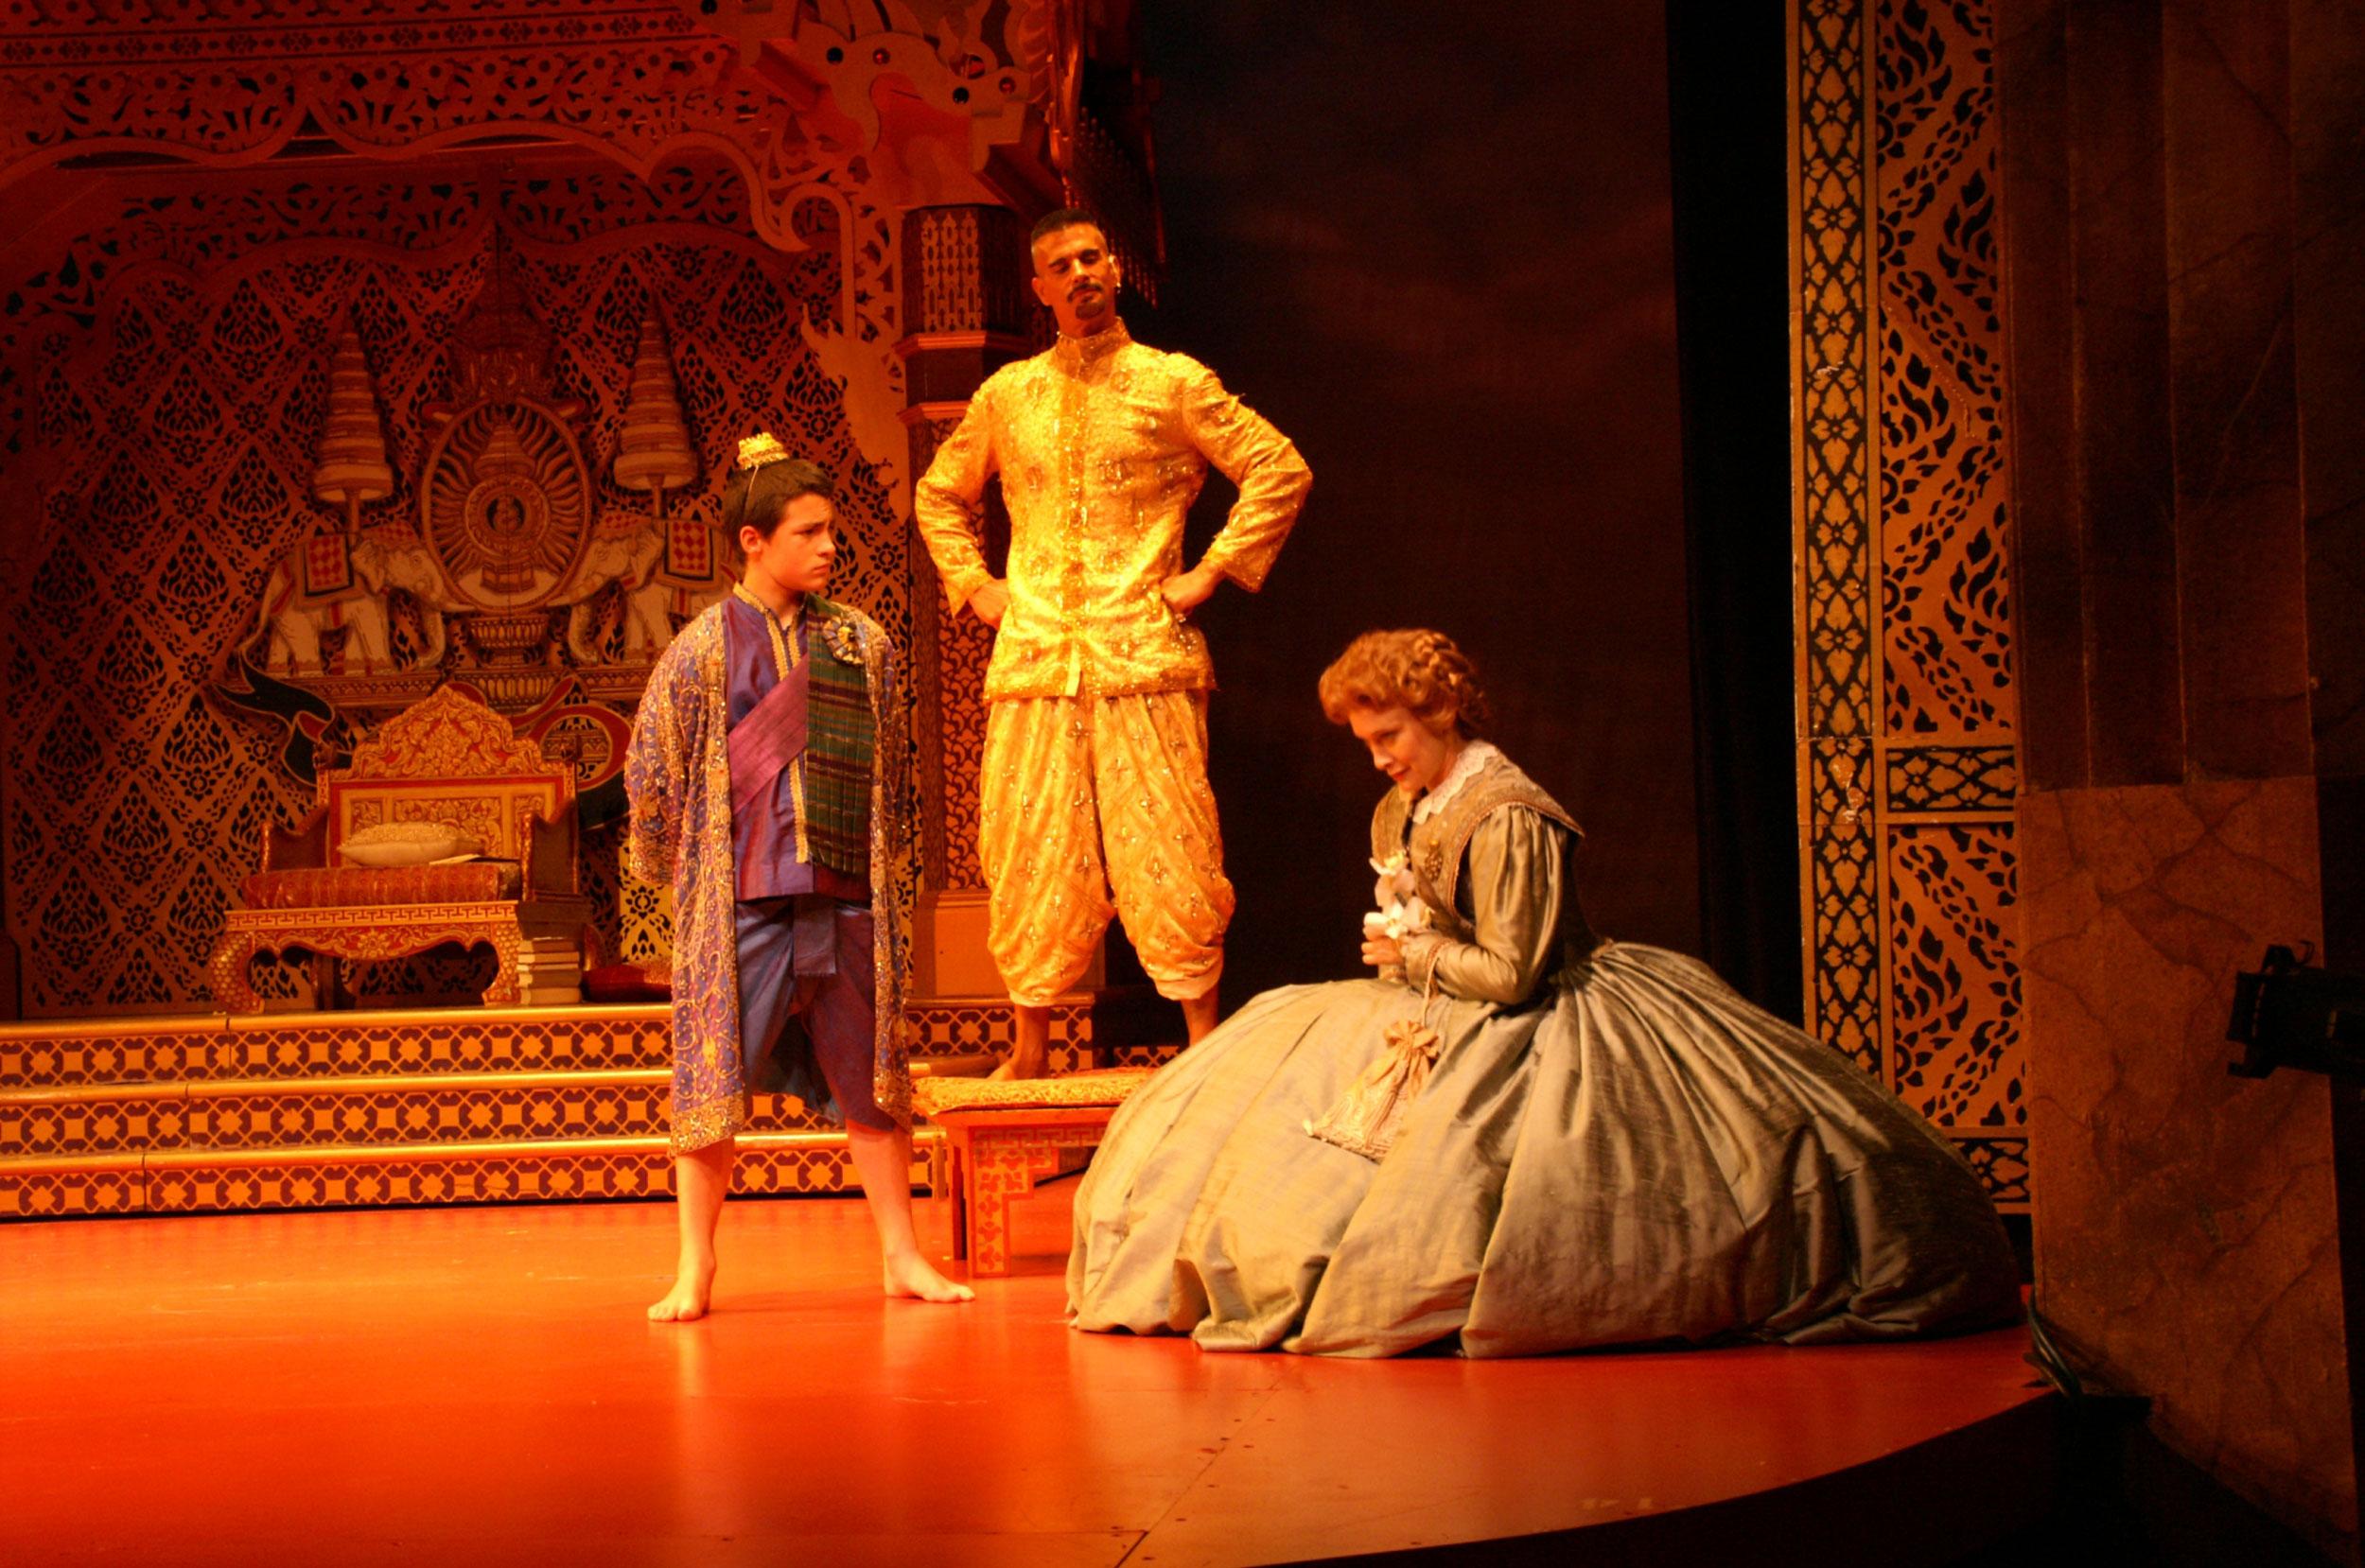 The-King-introduces-Anna-to-Prince-Chulalongkorn.jpg